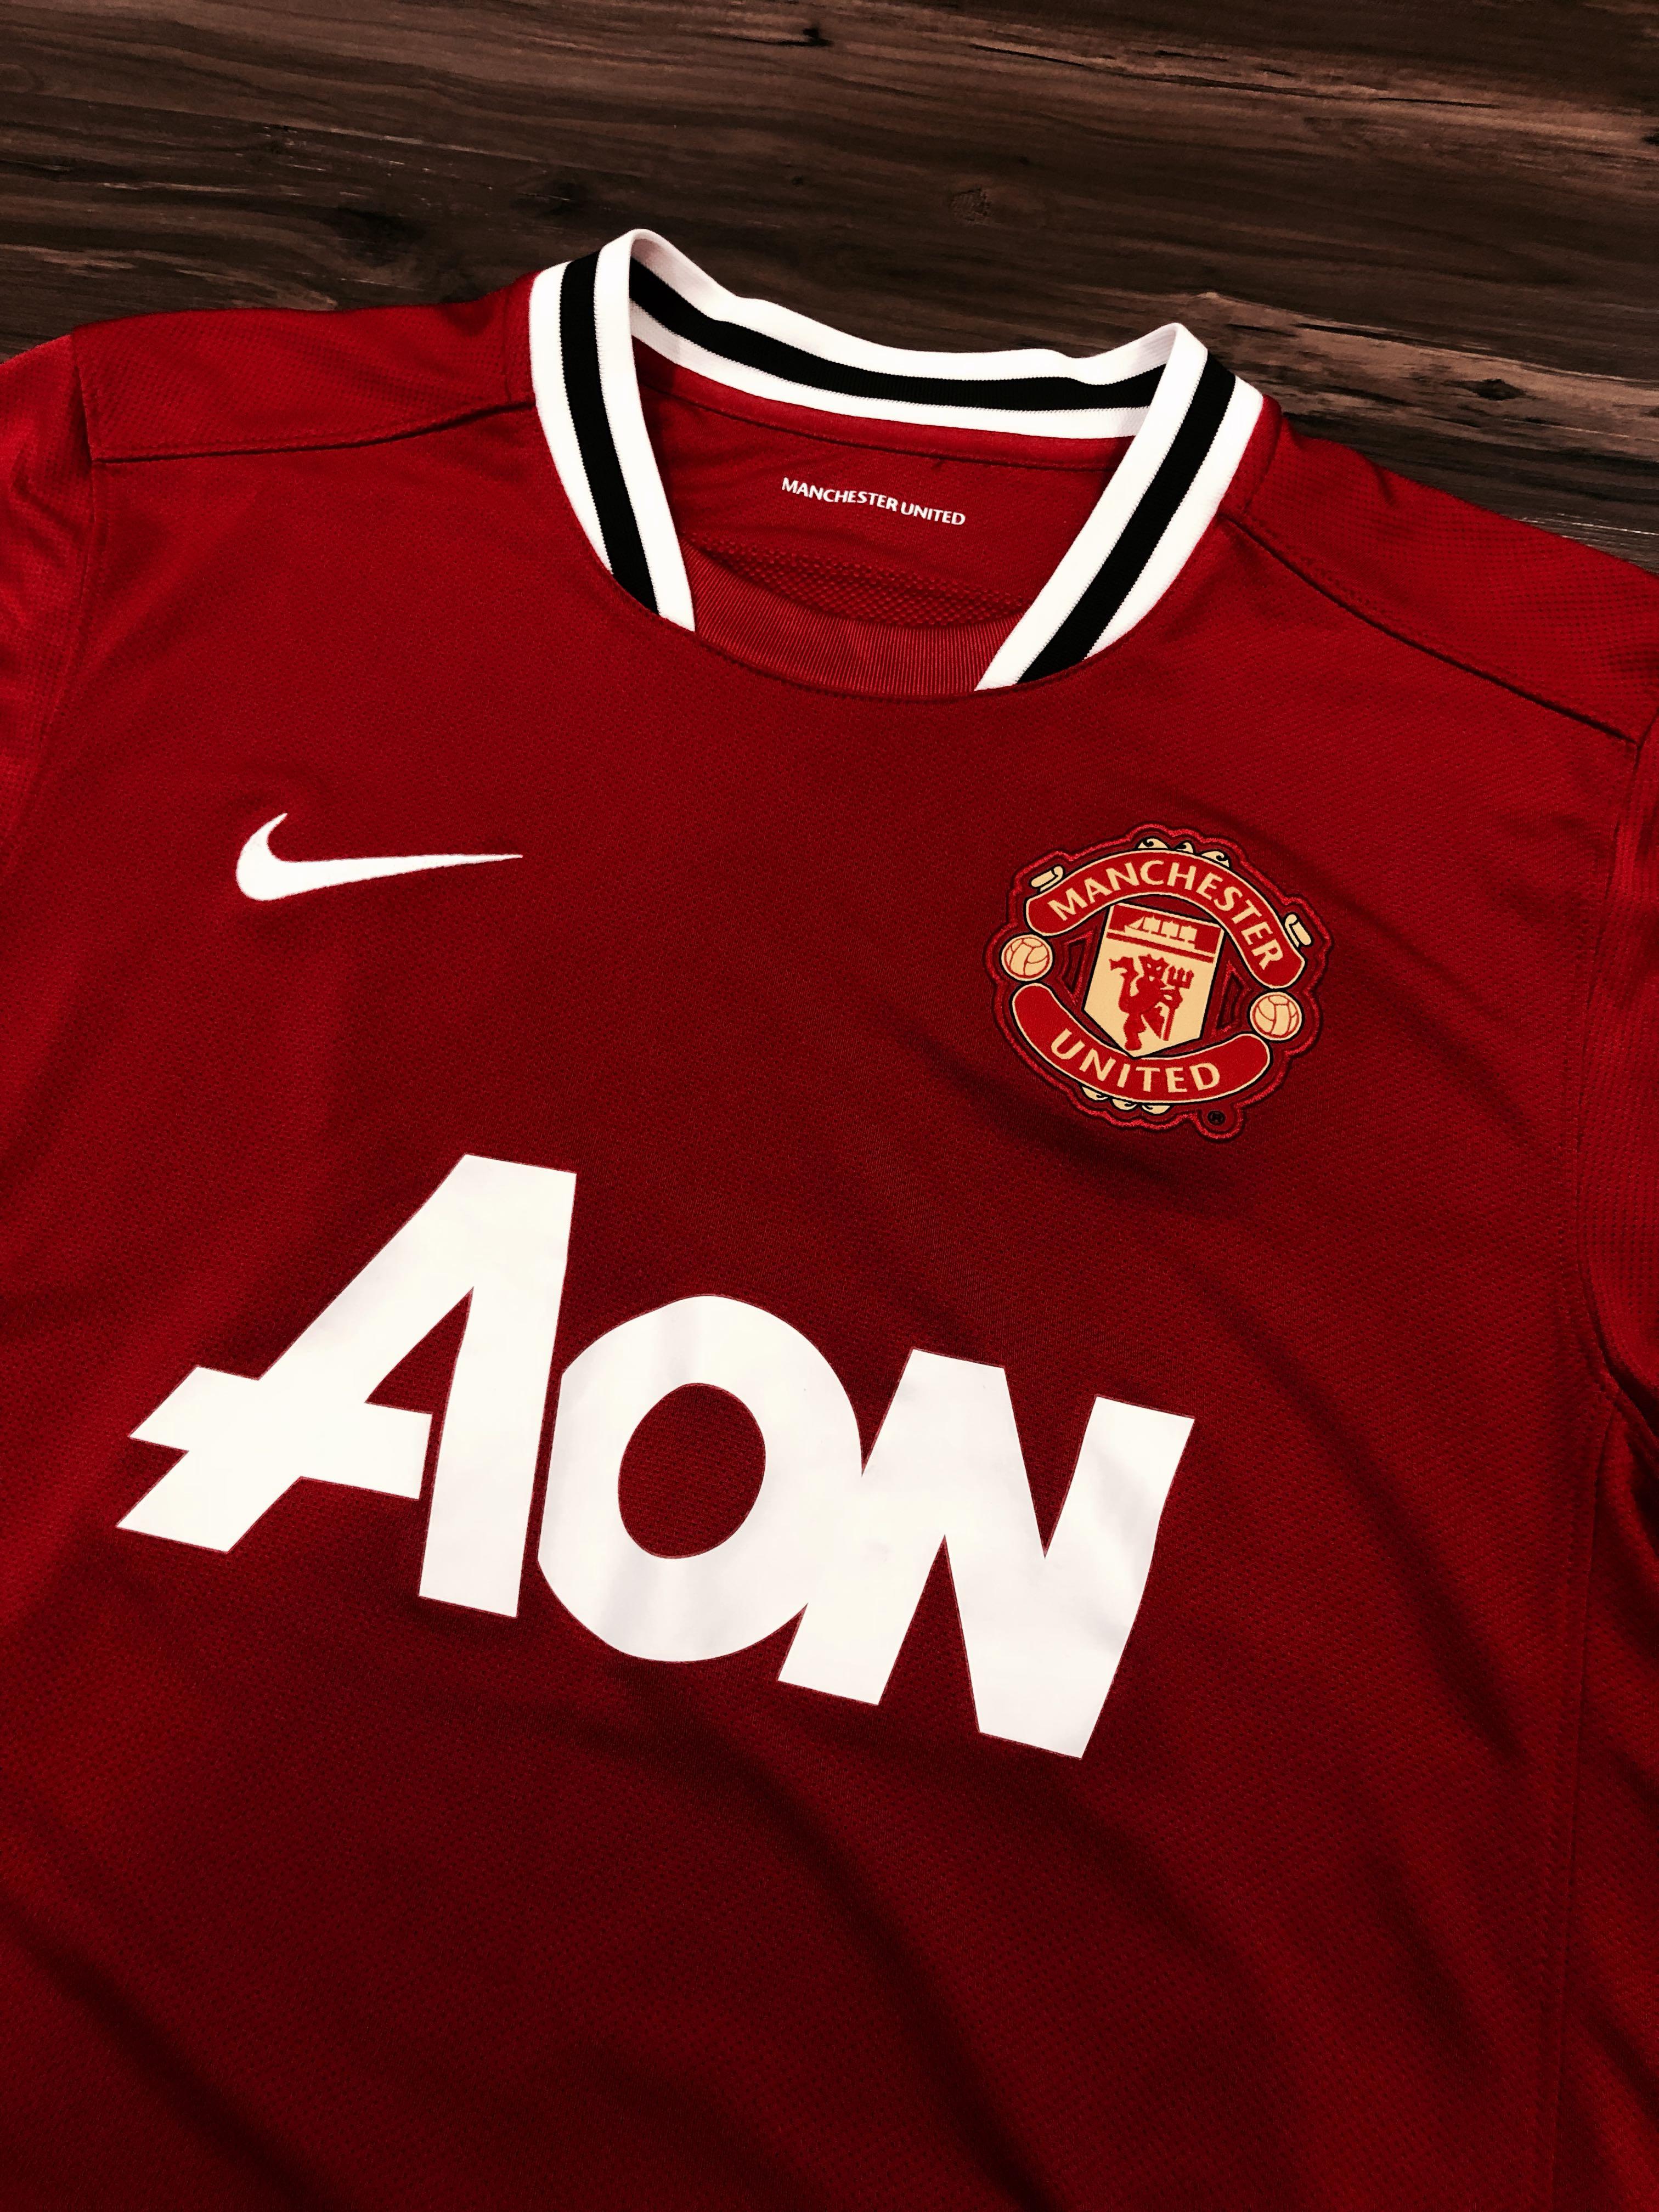 a22502de8b1 Manchester United 2011 12 Home Kit